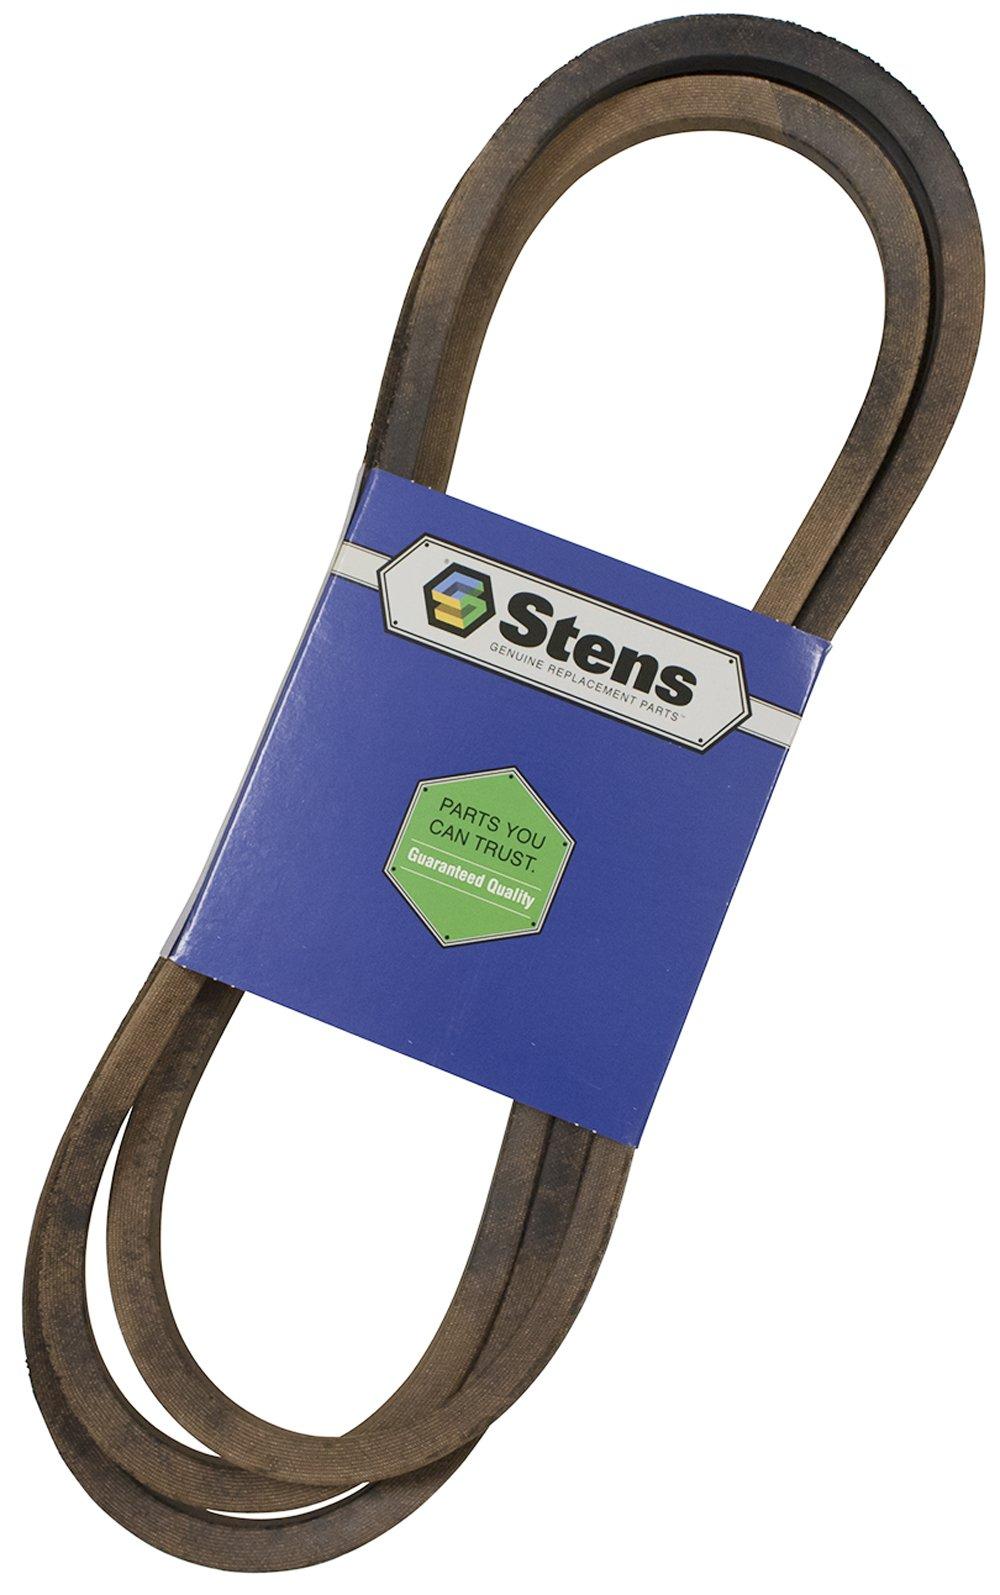 Stens 265-412 OEM Replacement Belt/Scag 482137